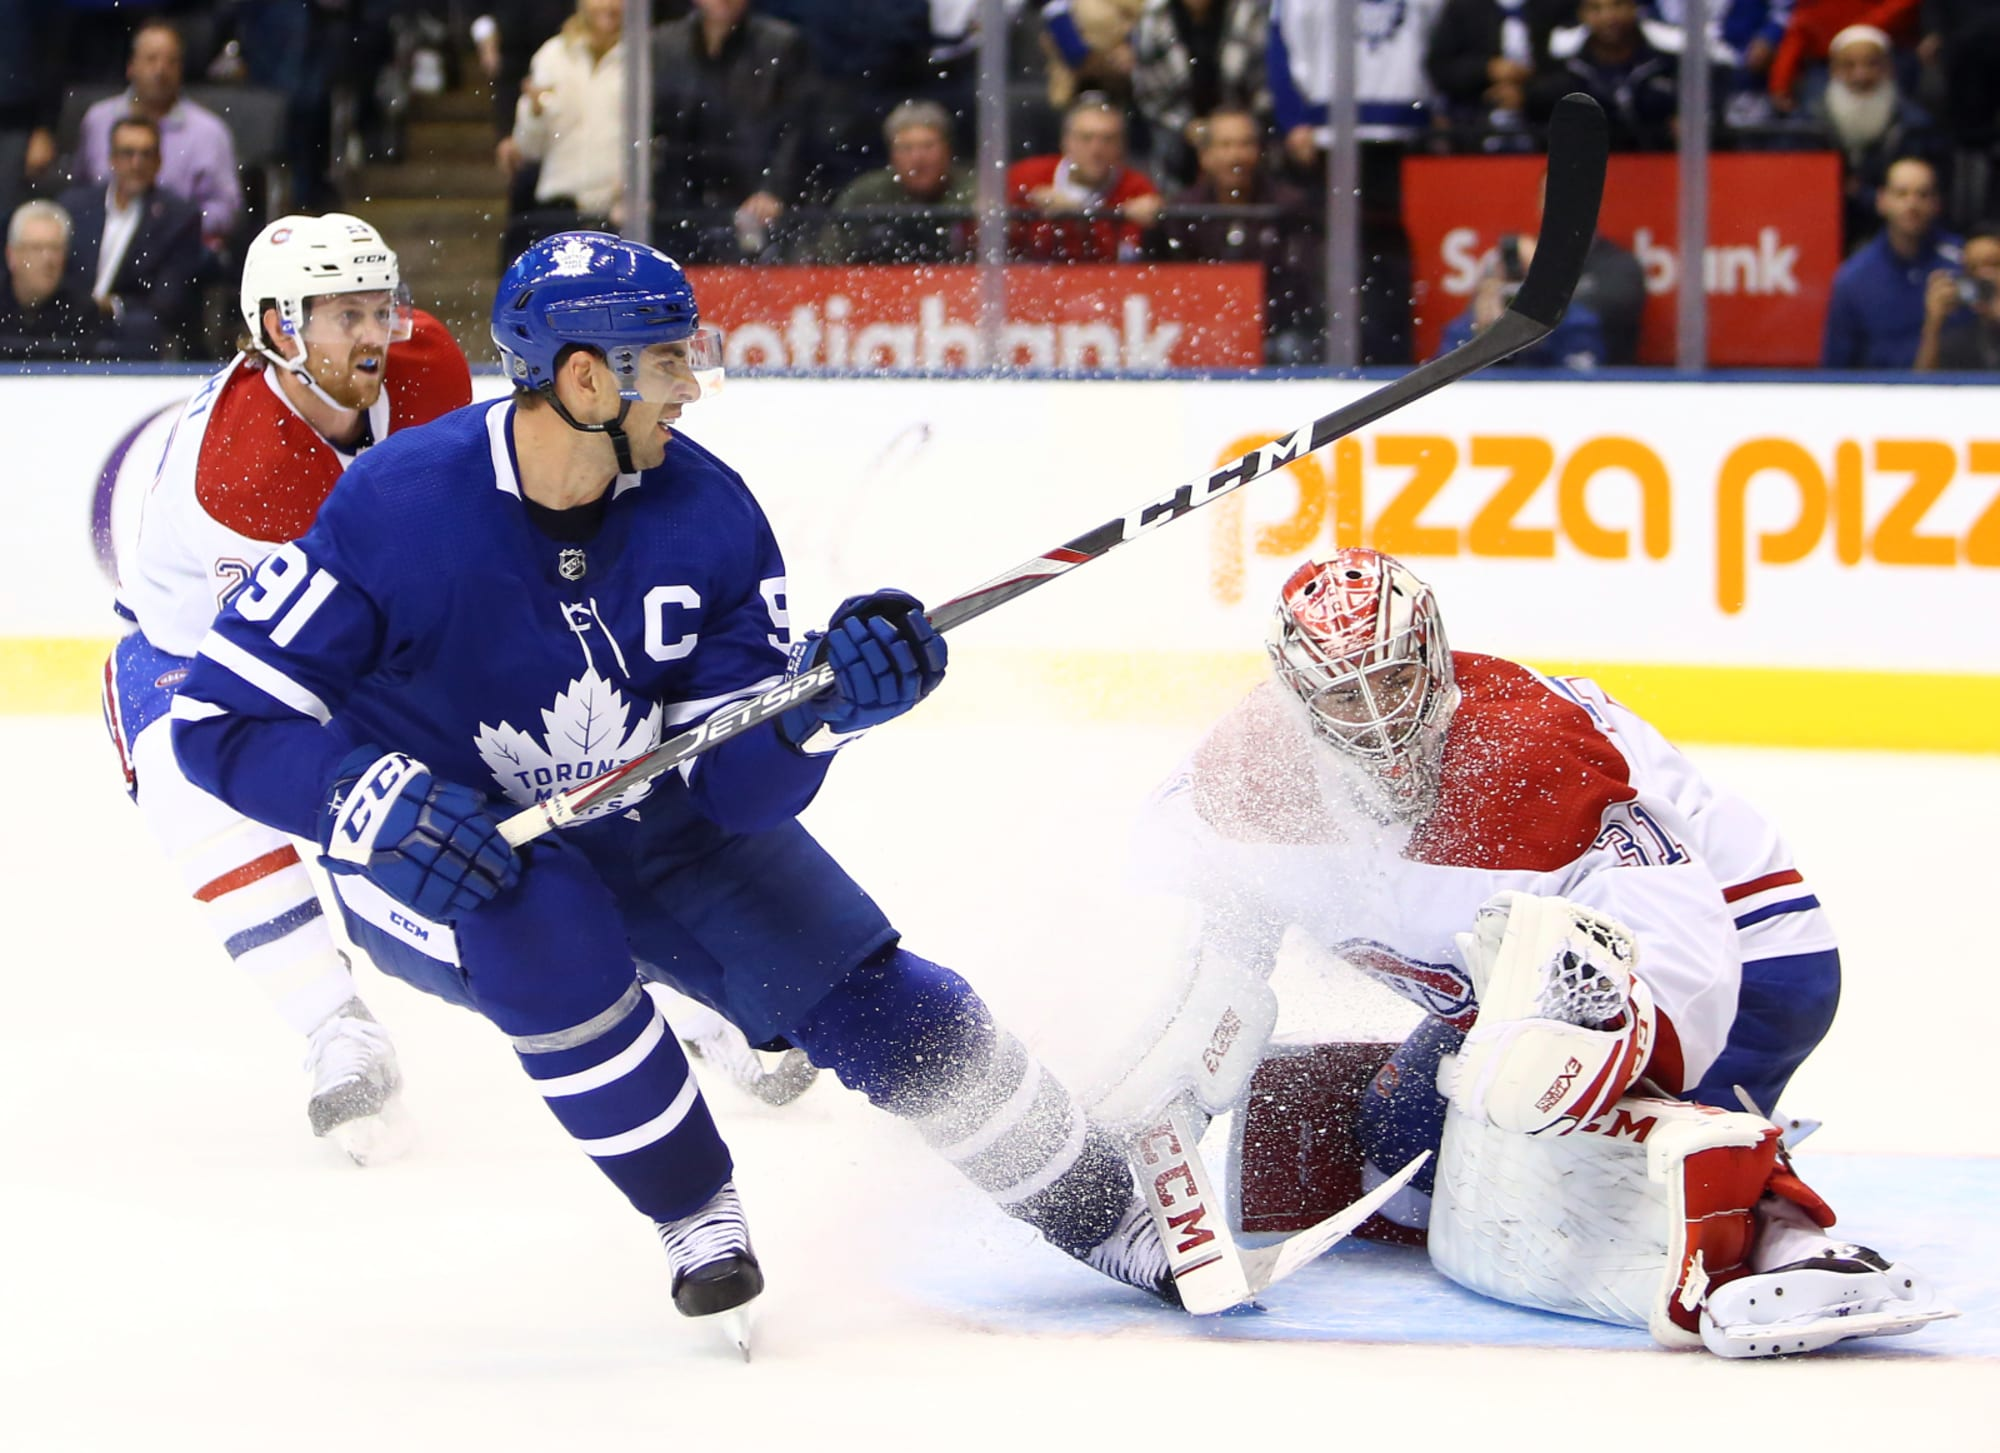 Toronto Maple Leafs: No reason to doubt signing John Tavares